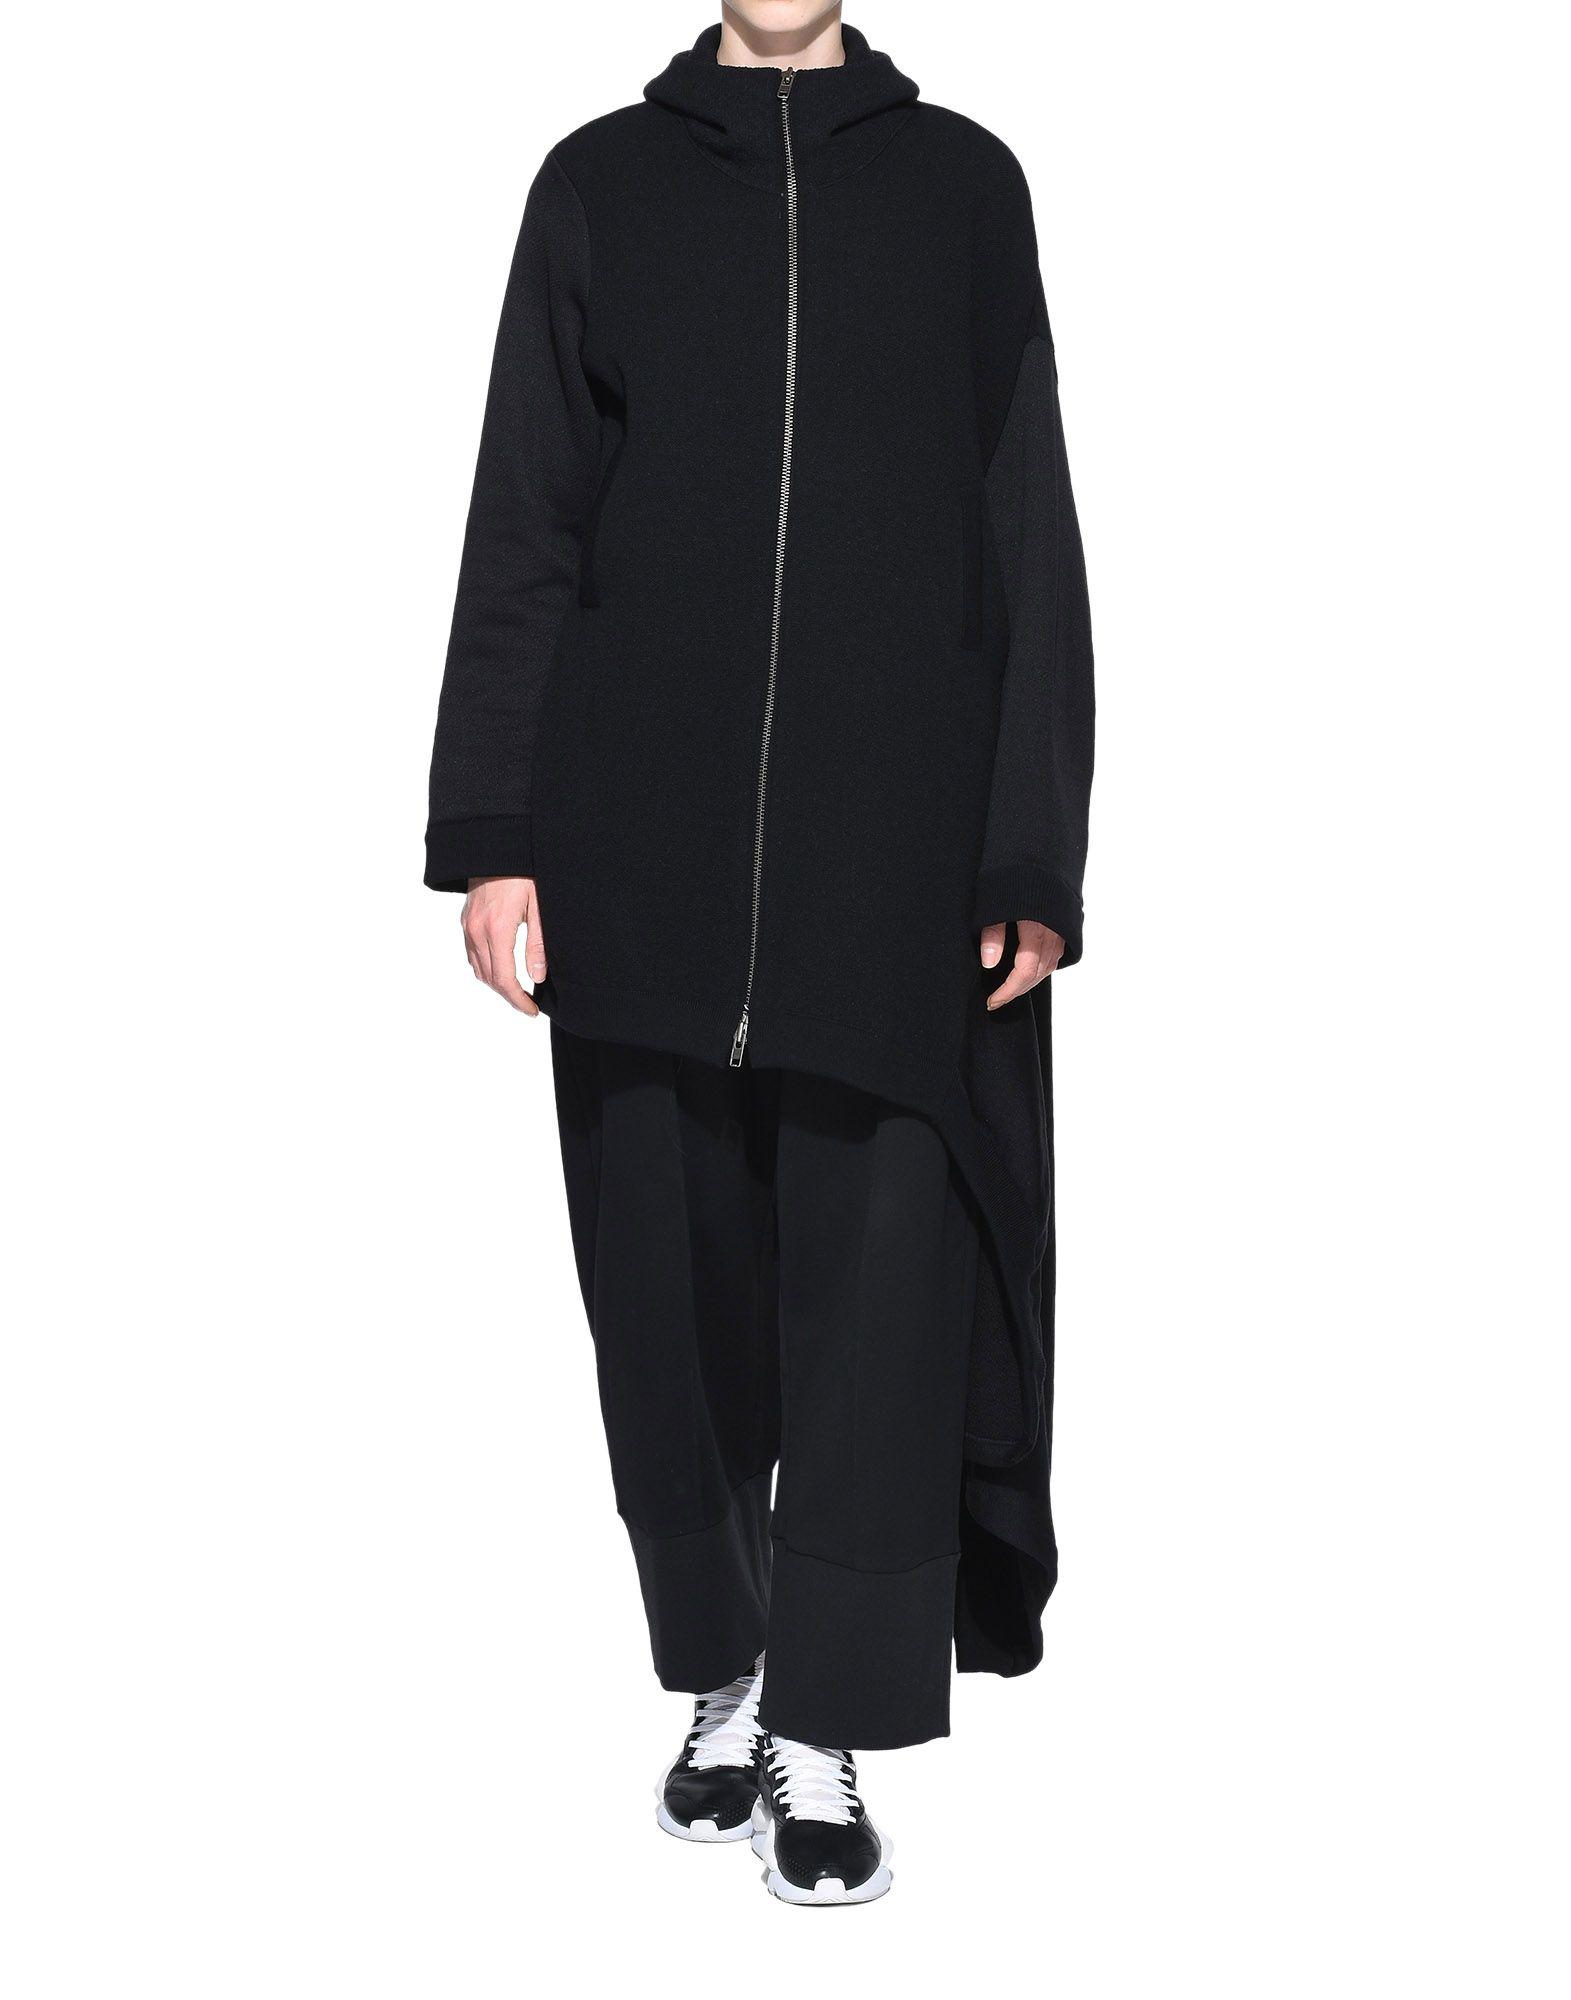 Y-3 Y-3 Knitted Hoodie Dress Vestito corto Donna a